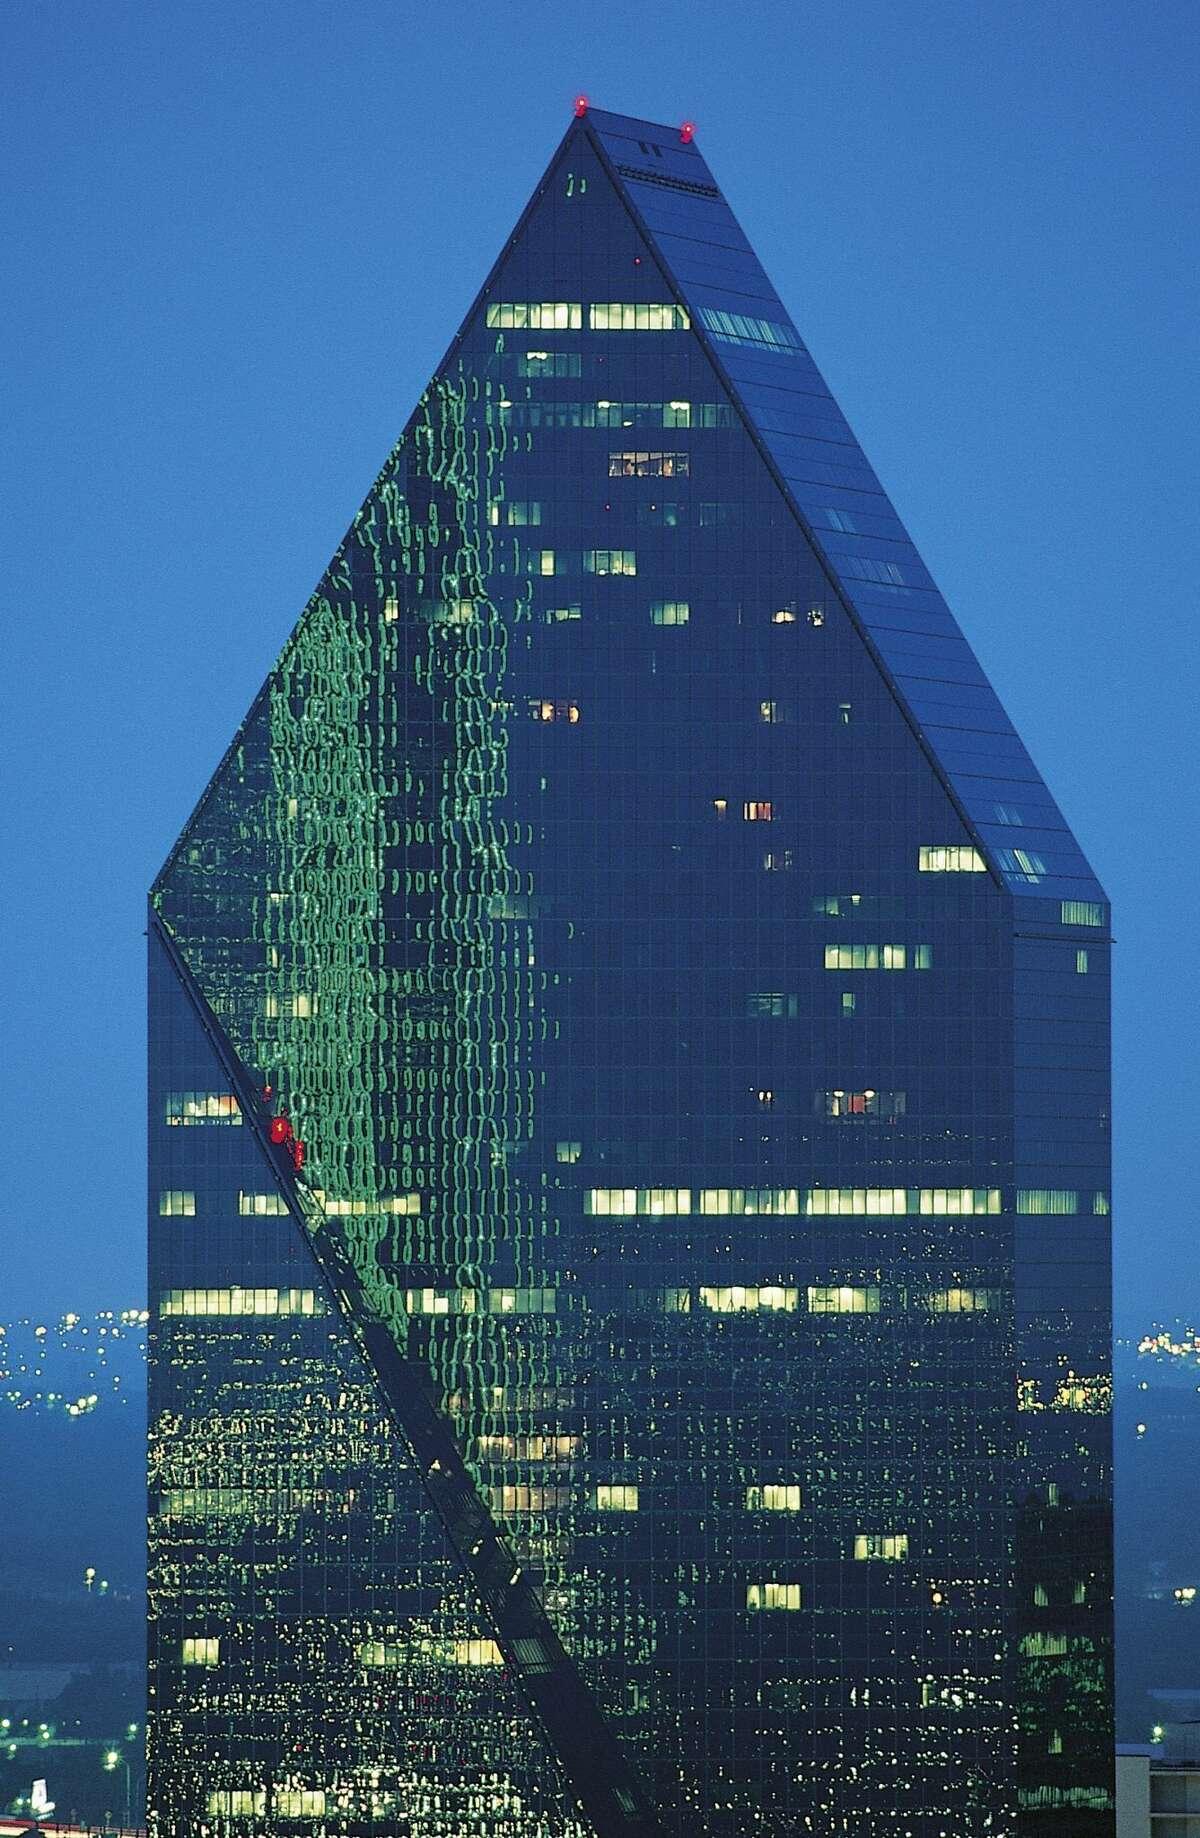 UNITED STATES - CIRCA 2003: Architect I.M. Pei'sFountain Place (1984-1986), downtown, Dallas, Texas, United States. (Photo by DeAgostini/Getty Images)